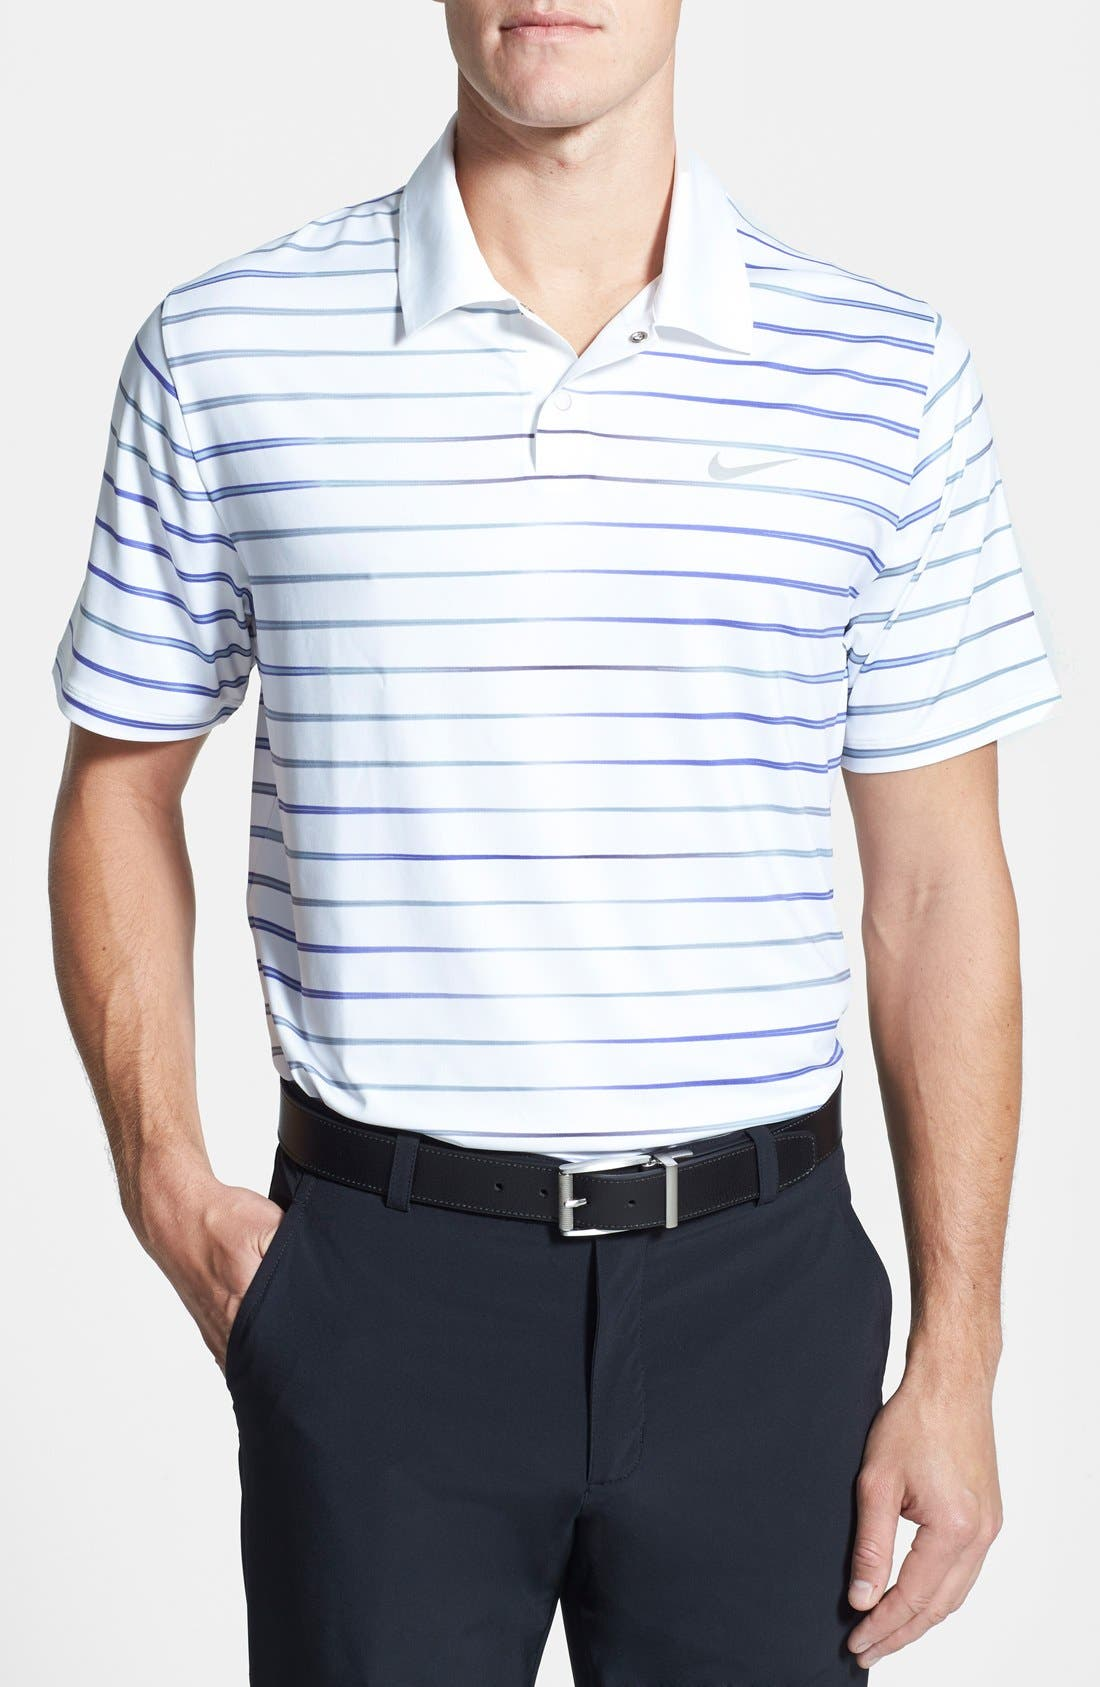 Main Image - Nike 'TW Iridescent Stripe' Dri-FIT Polo